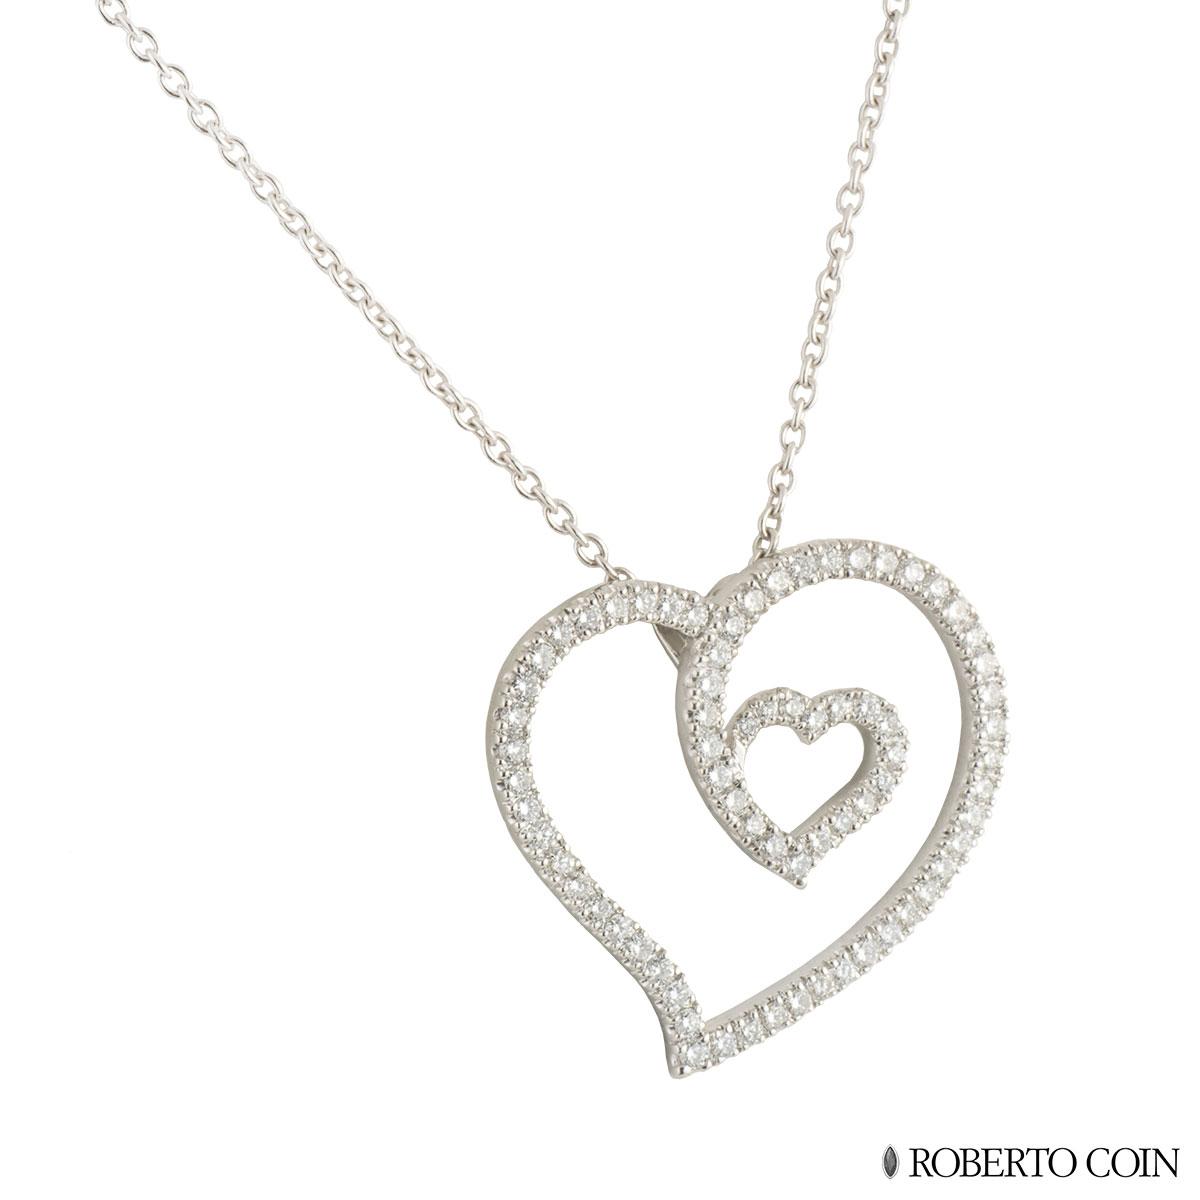 Roberto Coin White Gold Diamond Heart Pendant 0.96ct G/VS